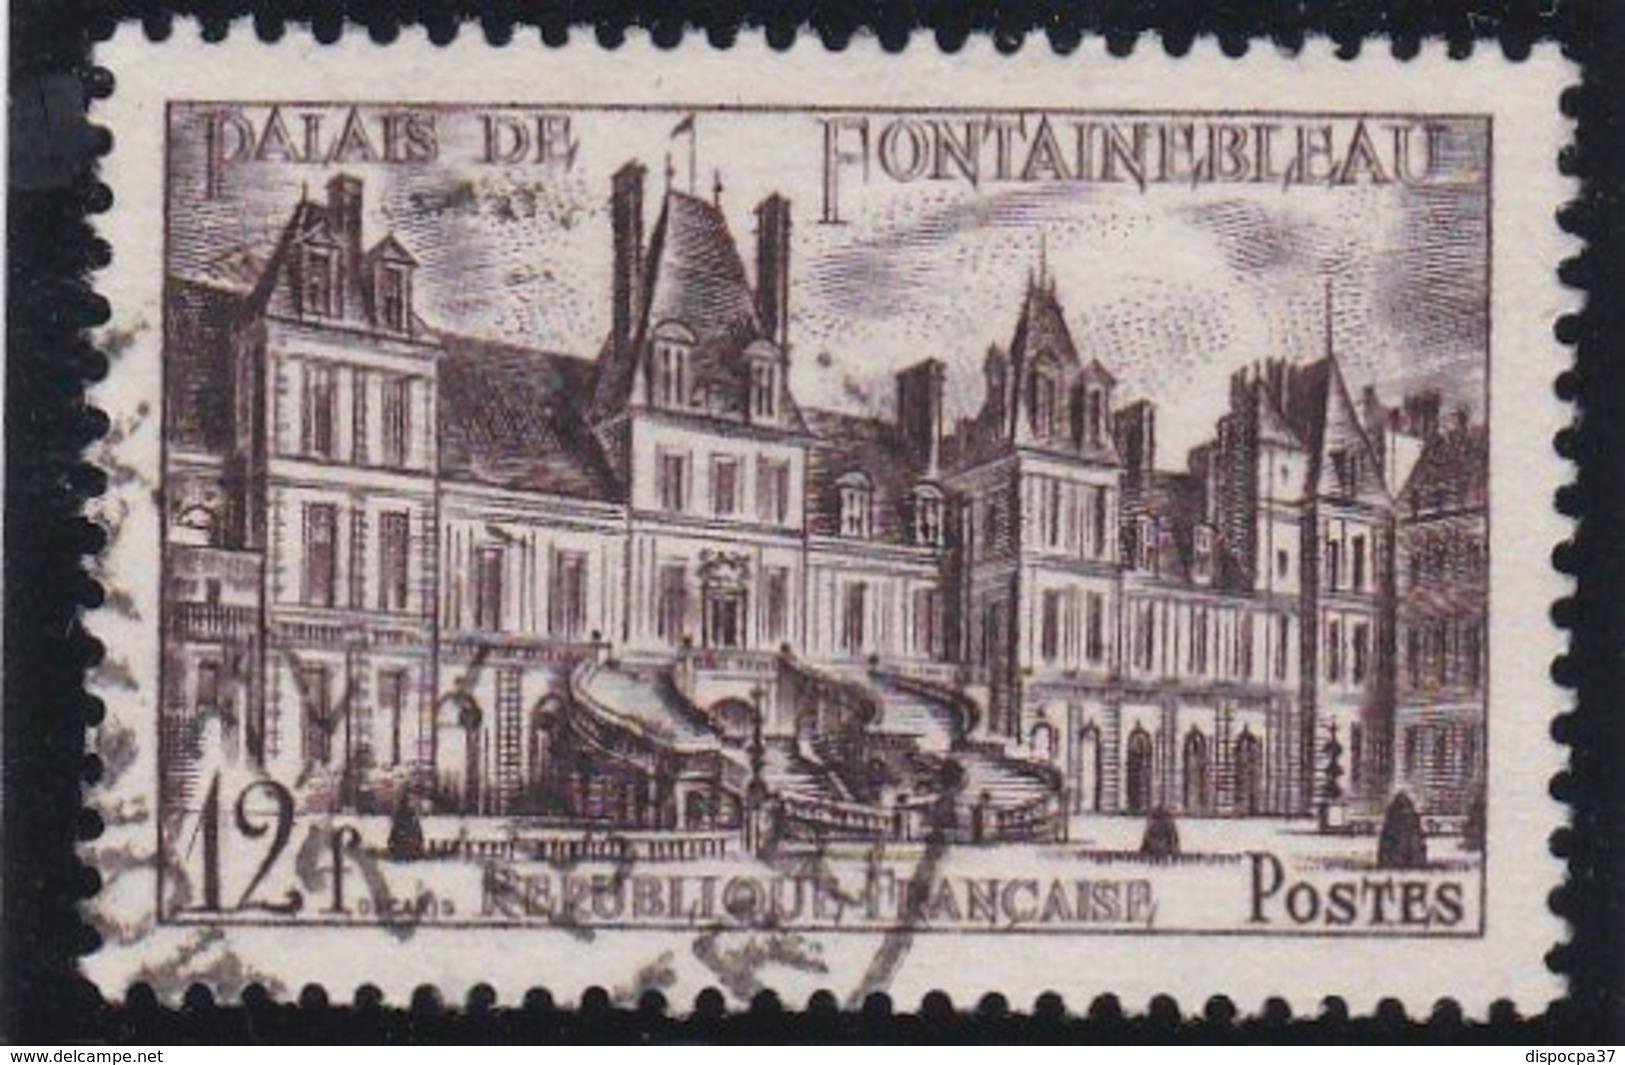 FRANCE Oblitéré N° 878 + CACHET ROND - REF MS - France